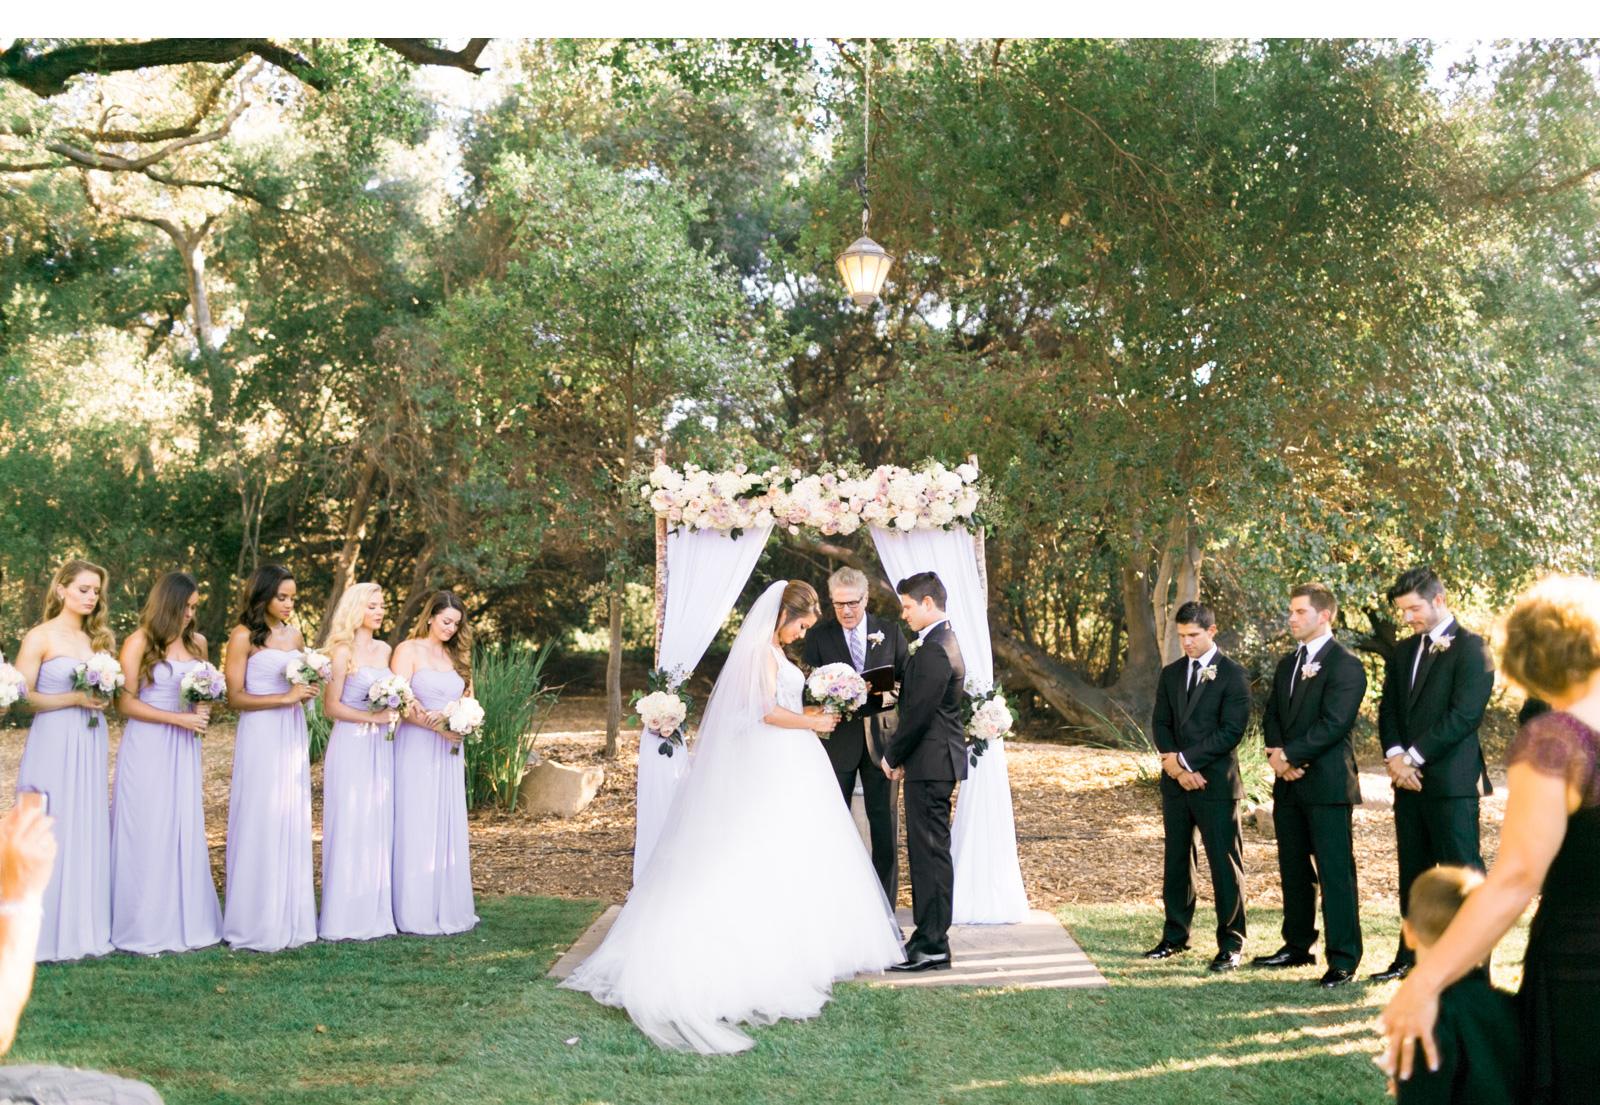 Nia-Sanchez-Wedding-Natalie-Schutt-Photography_07.jpg